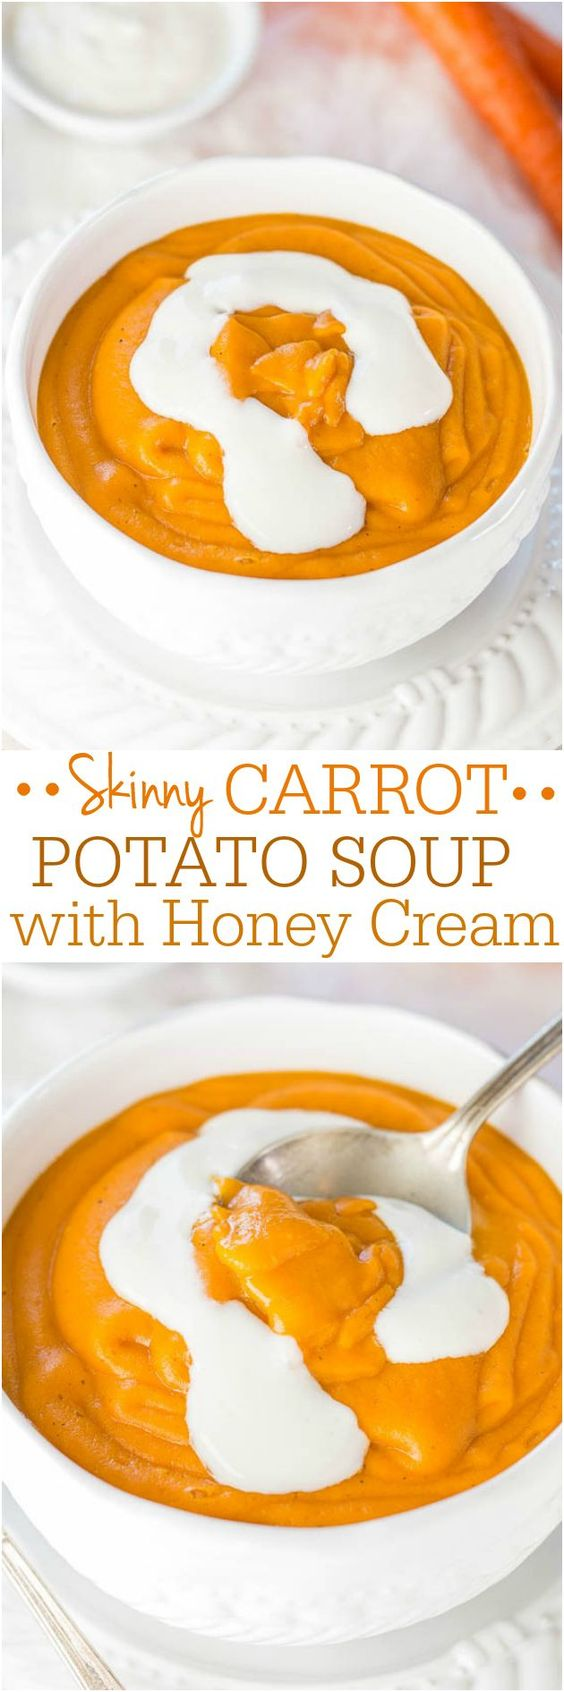 Skinny Carrot Potato Soup with Honey Cream - Healthy, hearty, fast ...